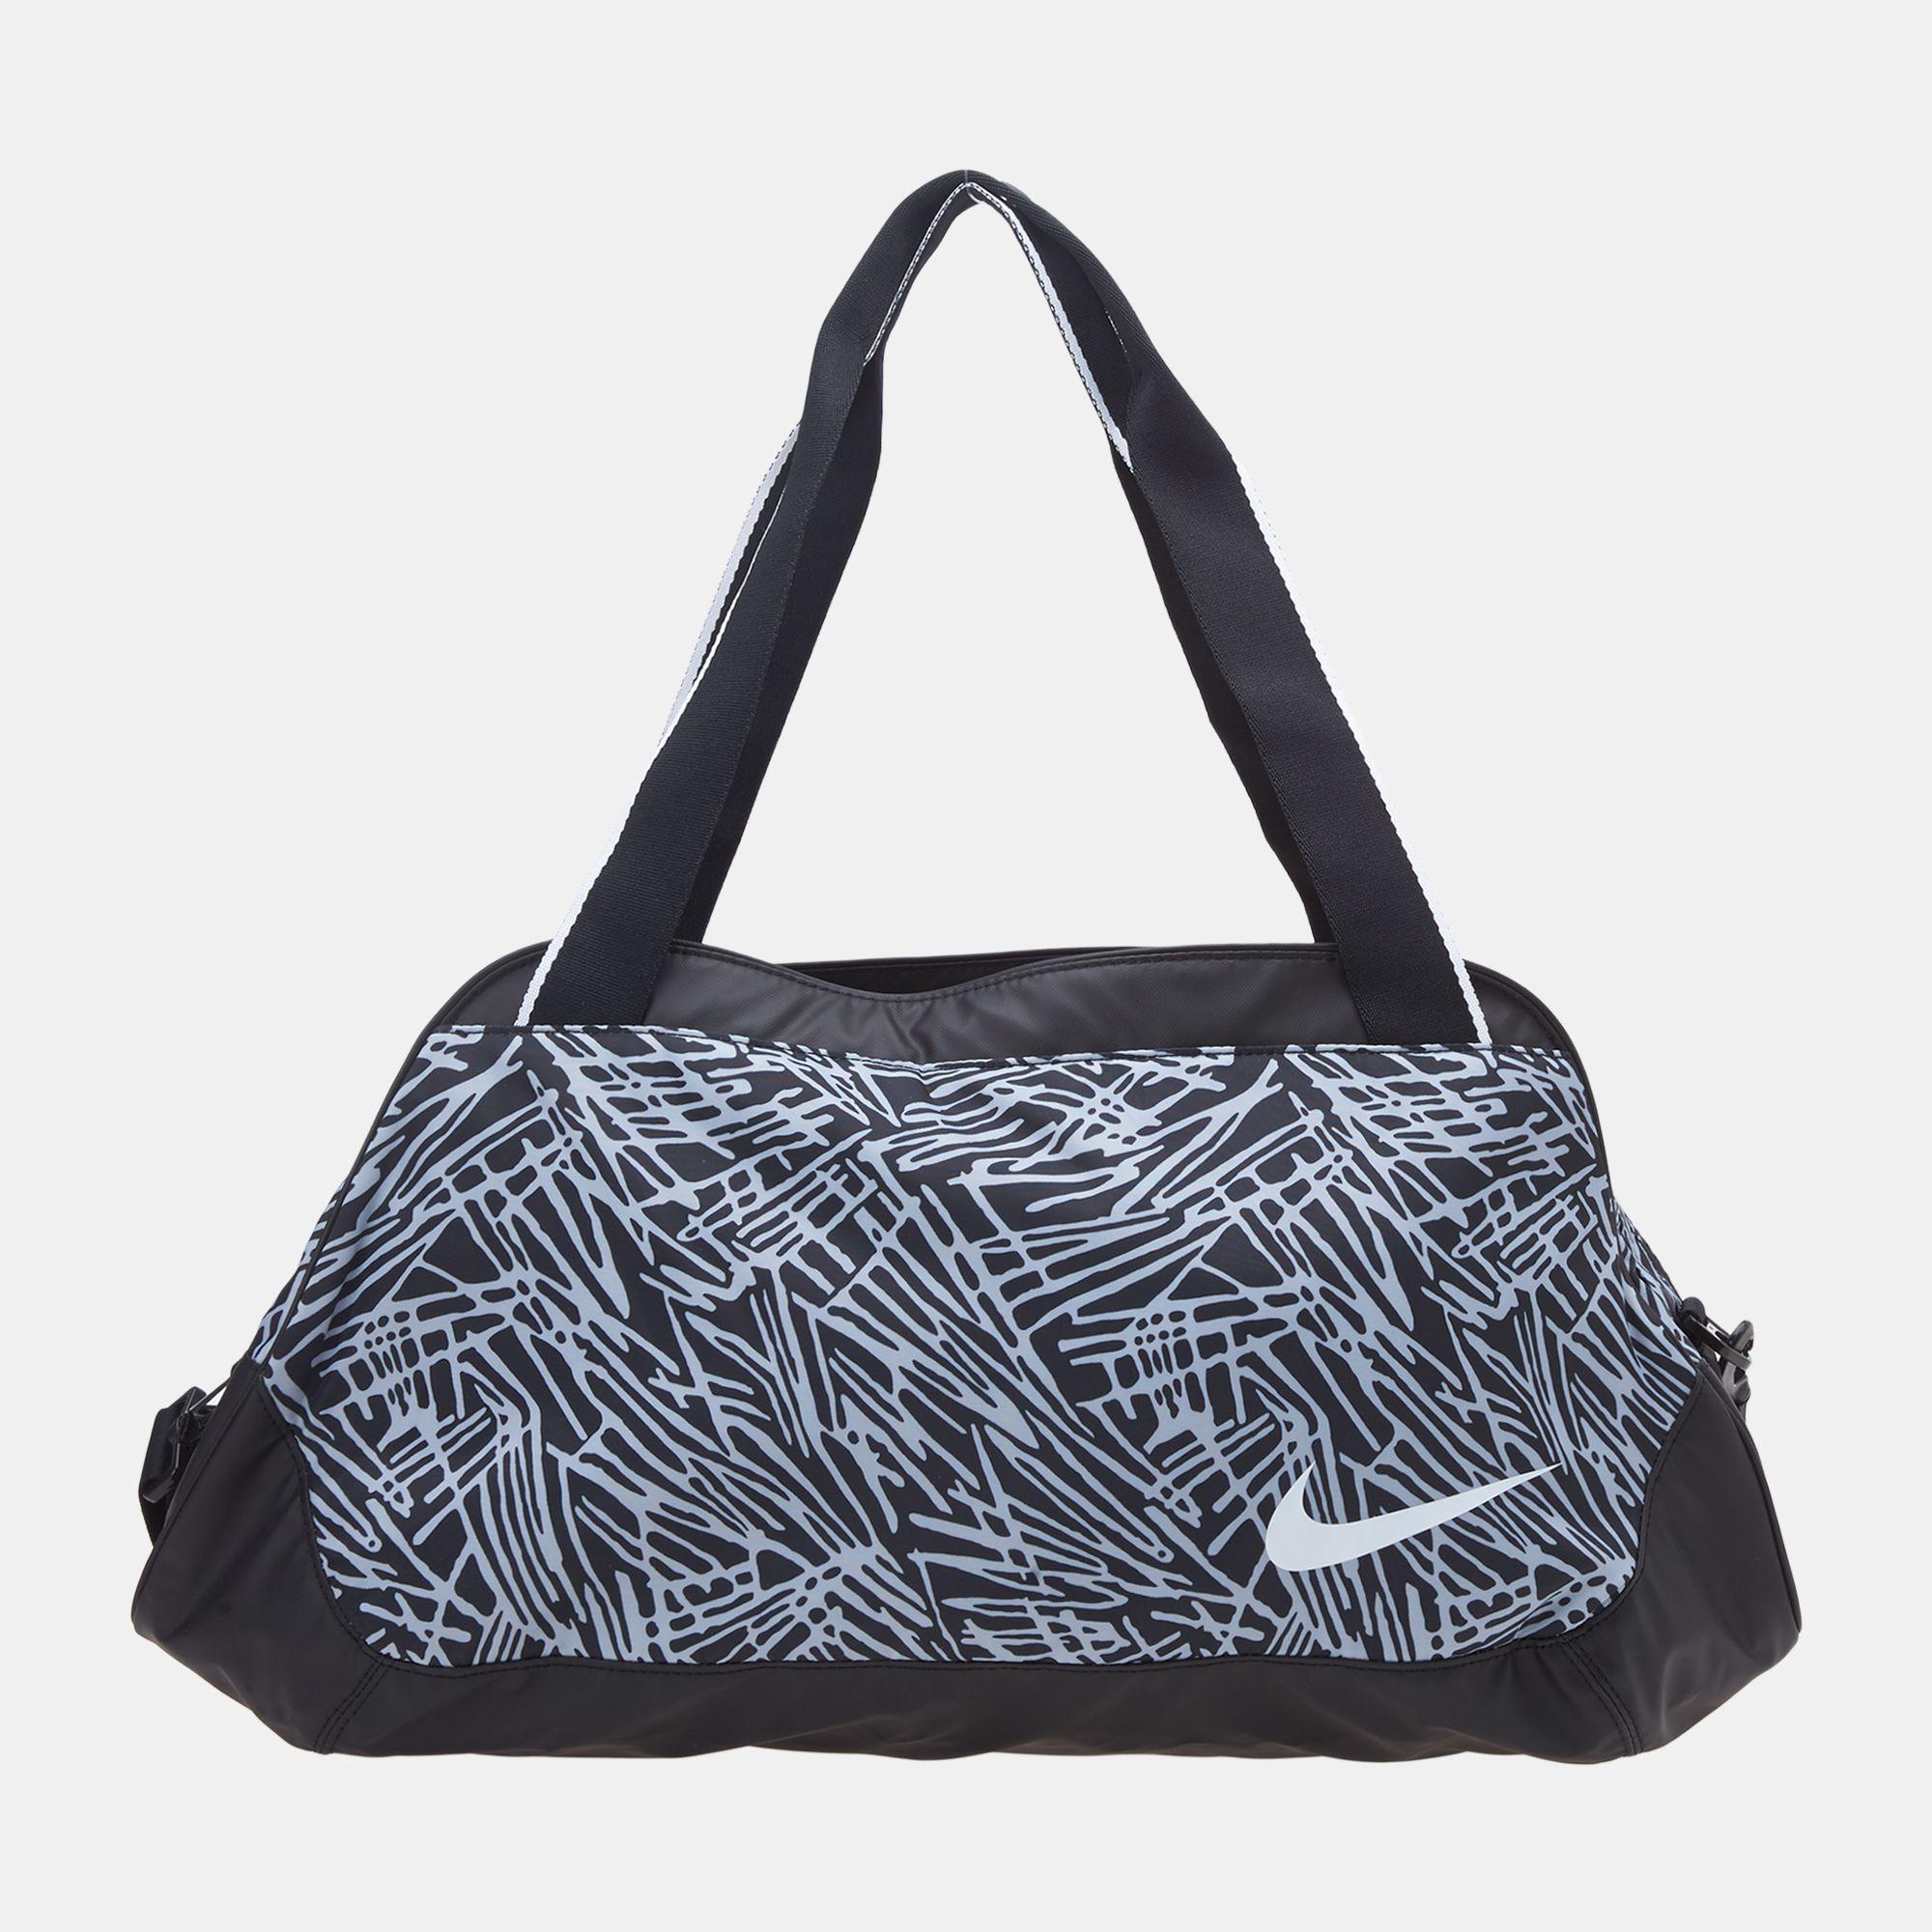 0ab40dc1081e Shop Nike Legend Club Print Duffel Bag 710